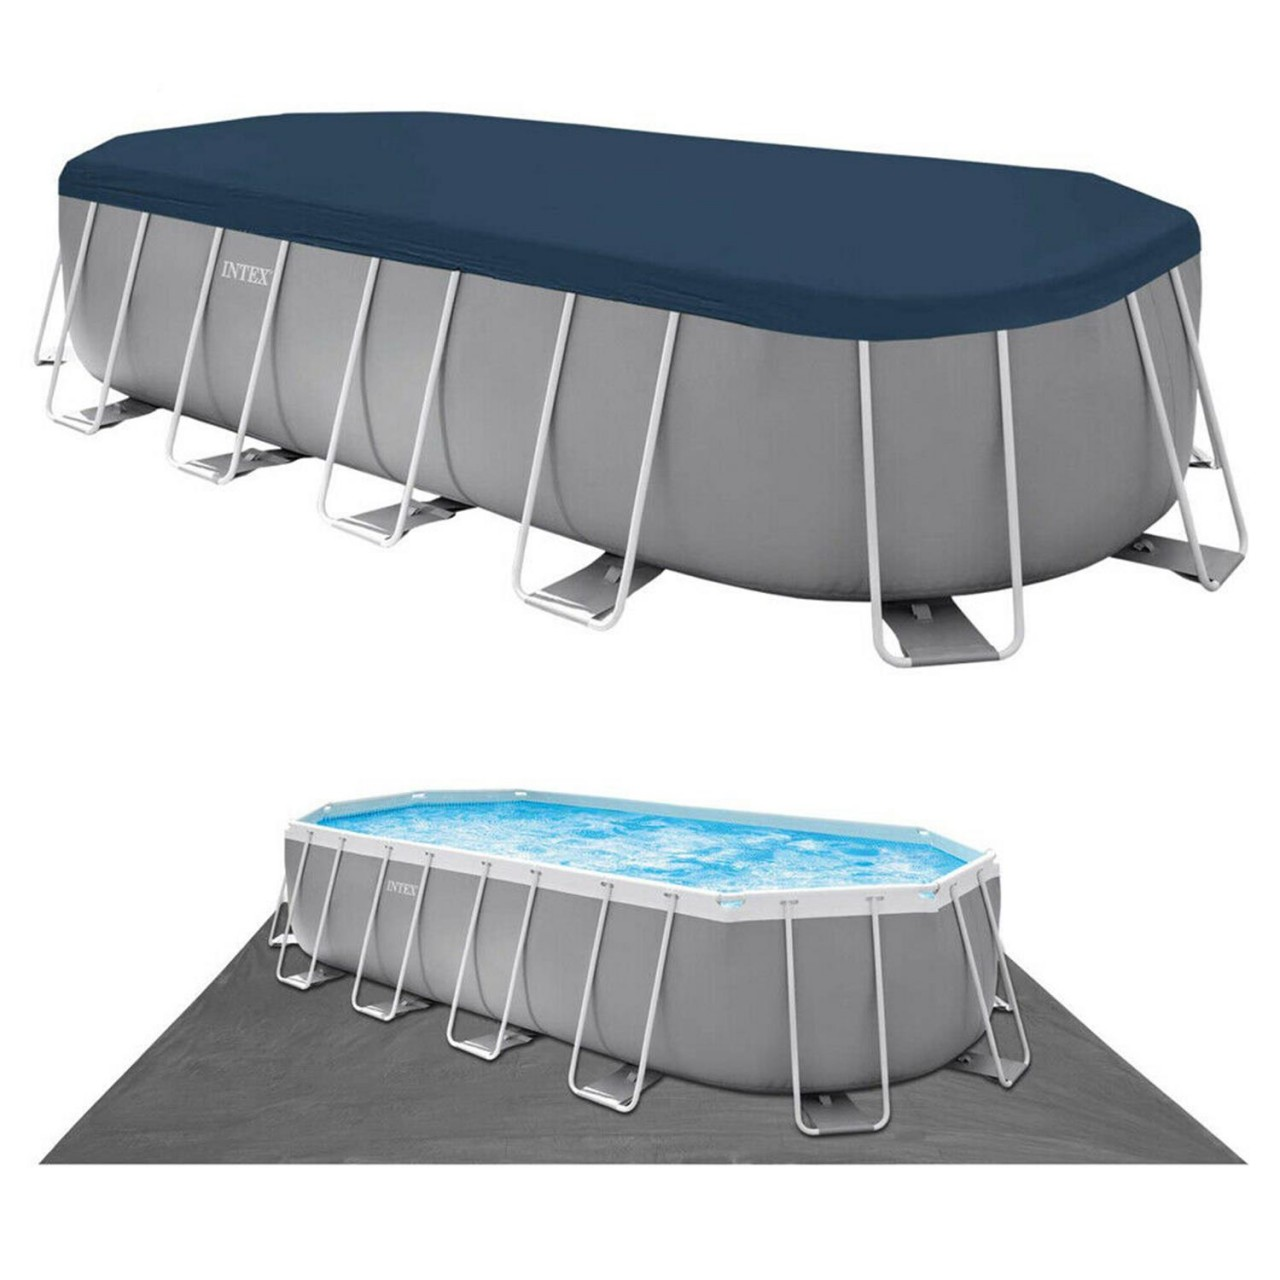 Intex Prism Frame Oval Pool Swimming Pool 503x274x122 cm Schwimmbad Filterpumpe